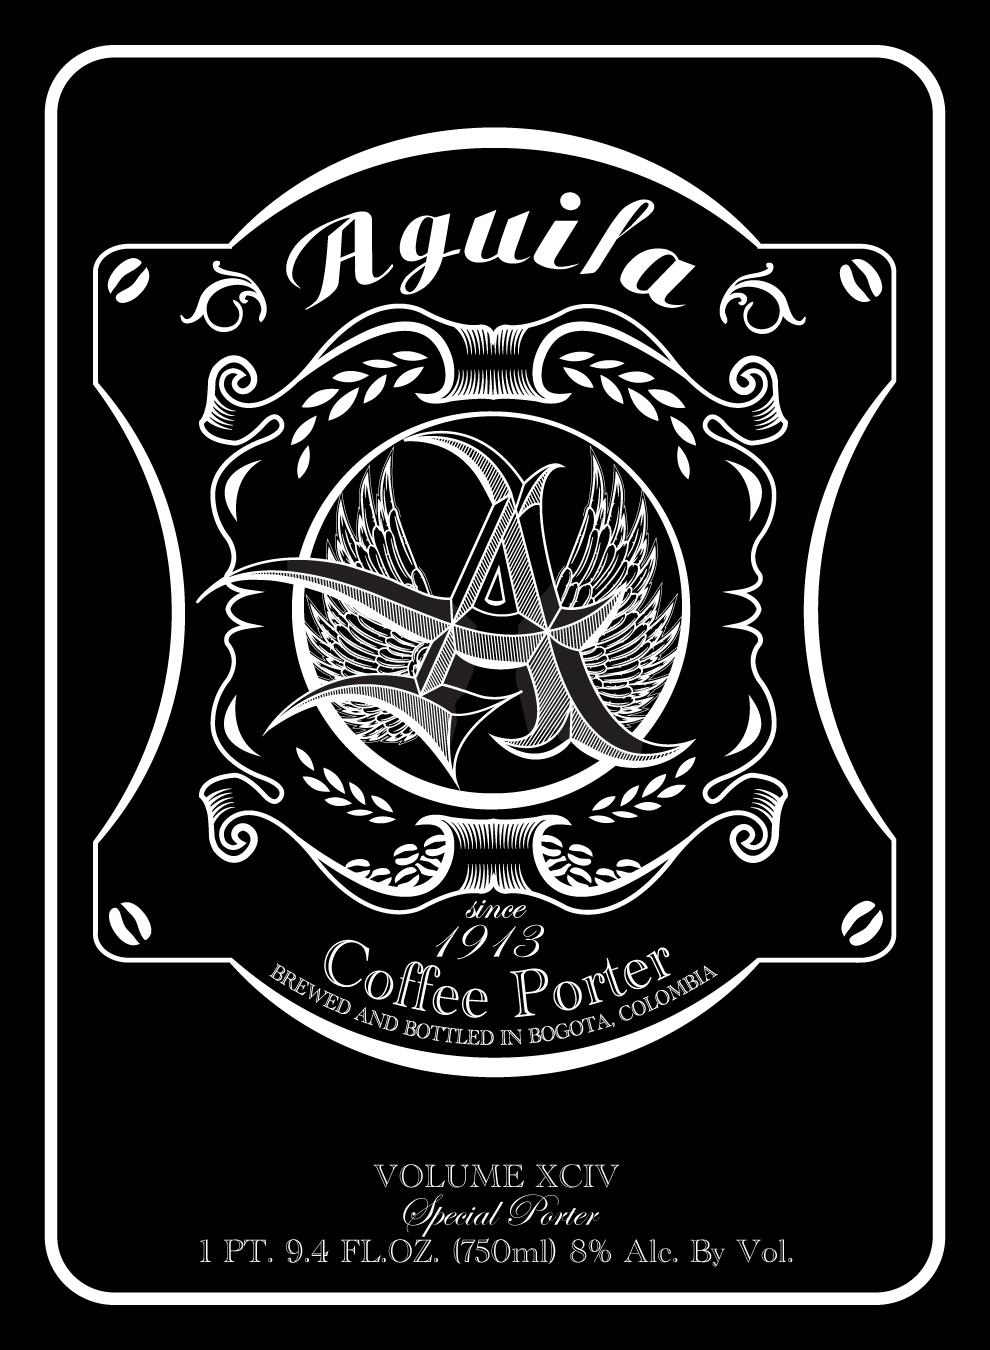 Aguila_booklet-1.jpg